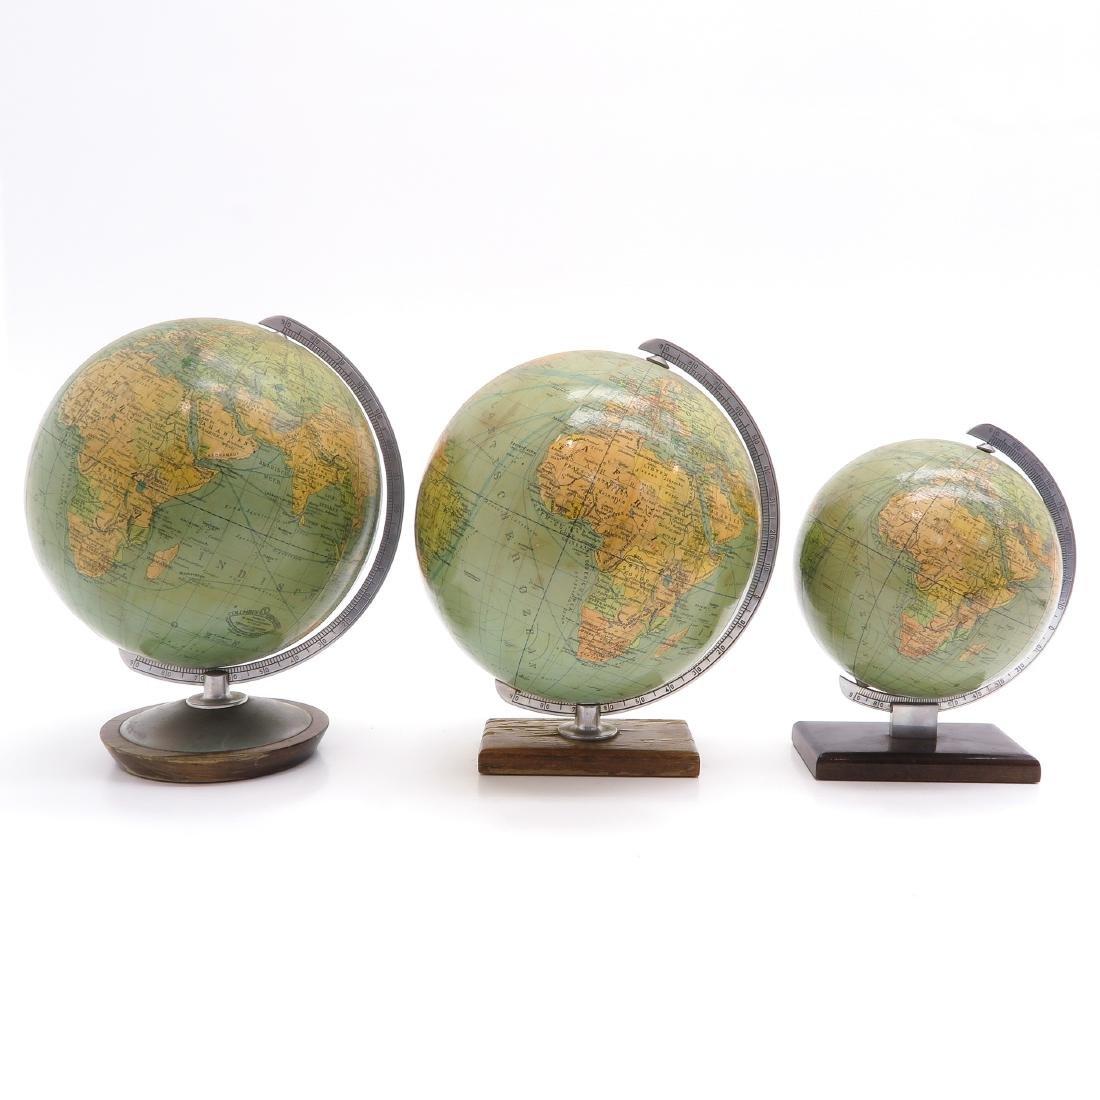 A Lot of 3 Columbus Erdglobus Globes - 4